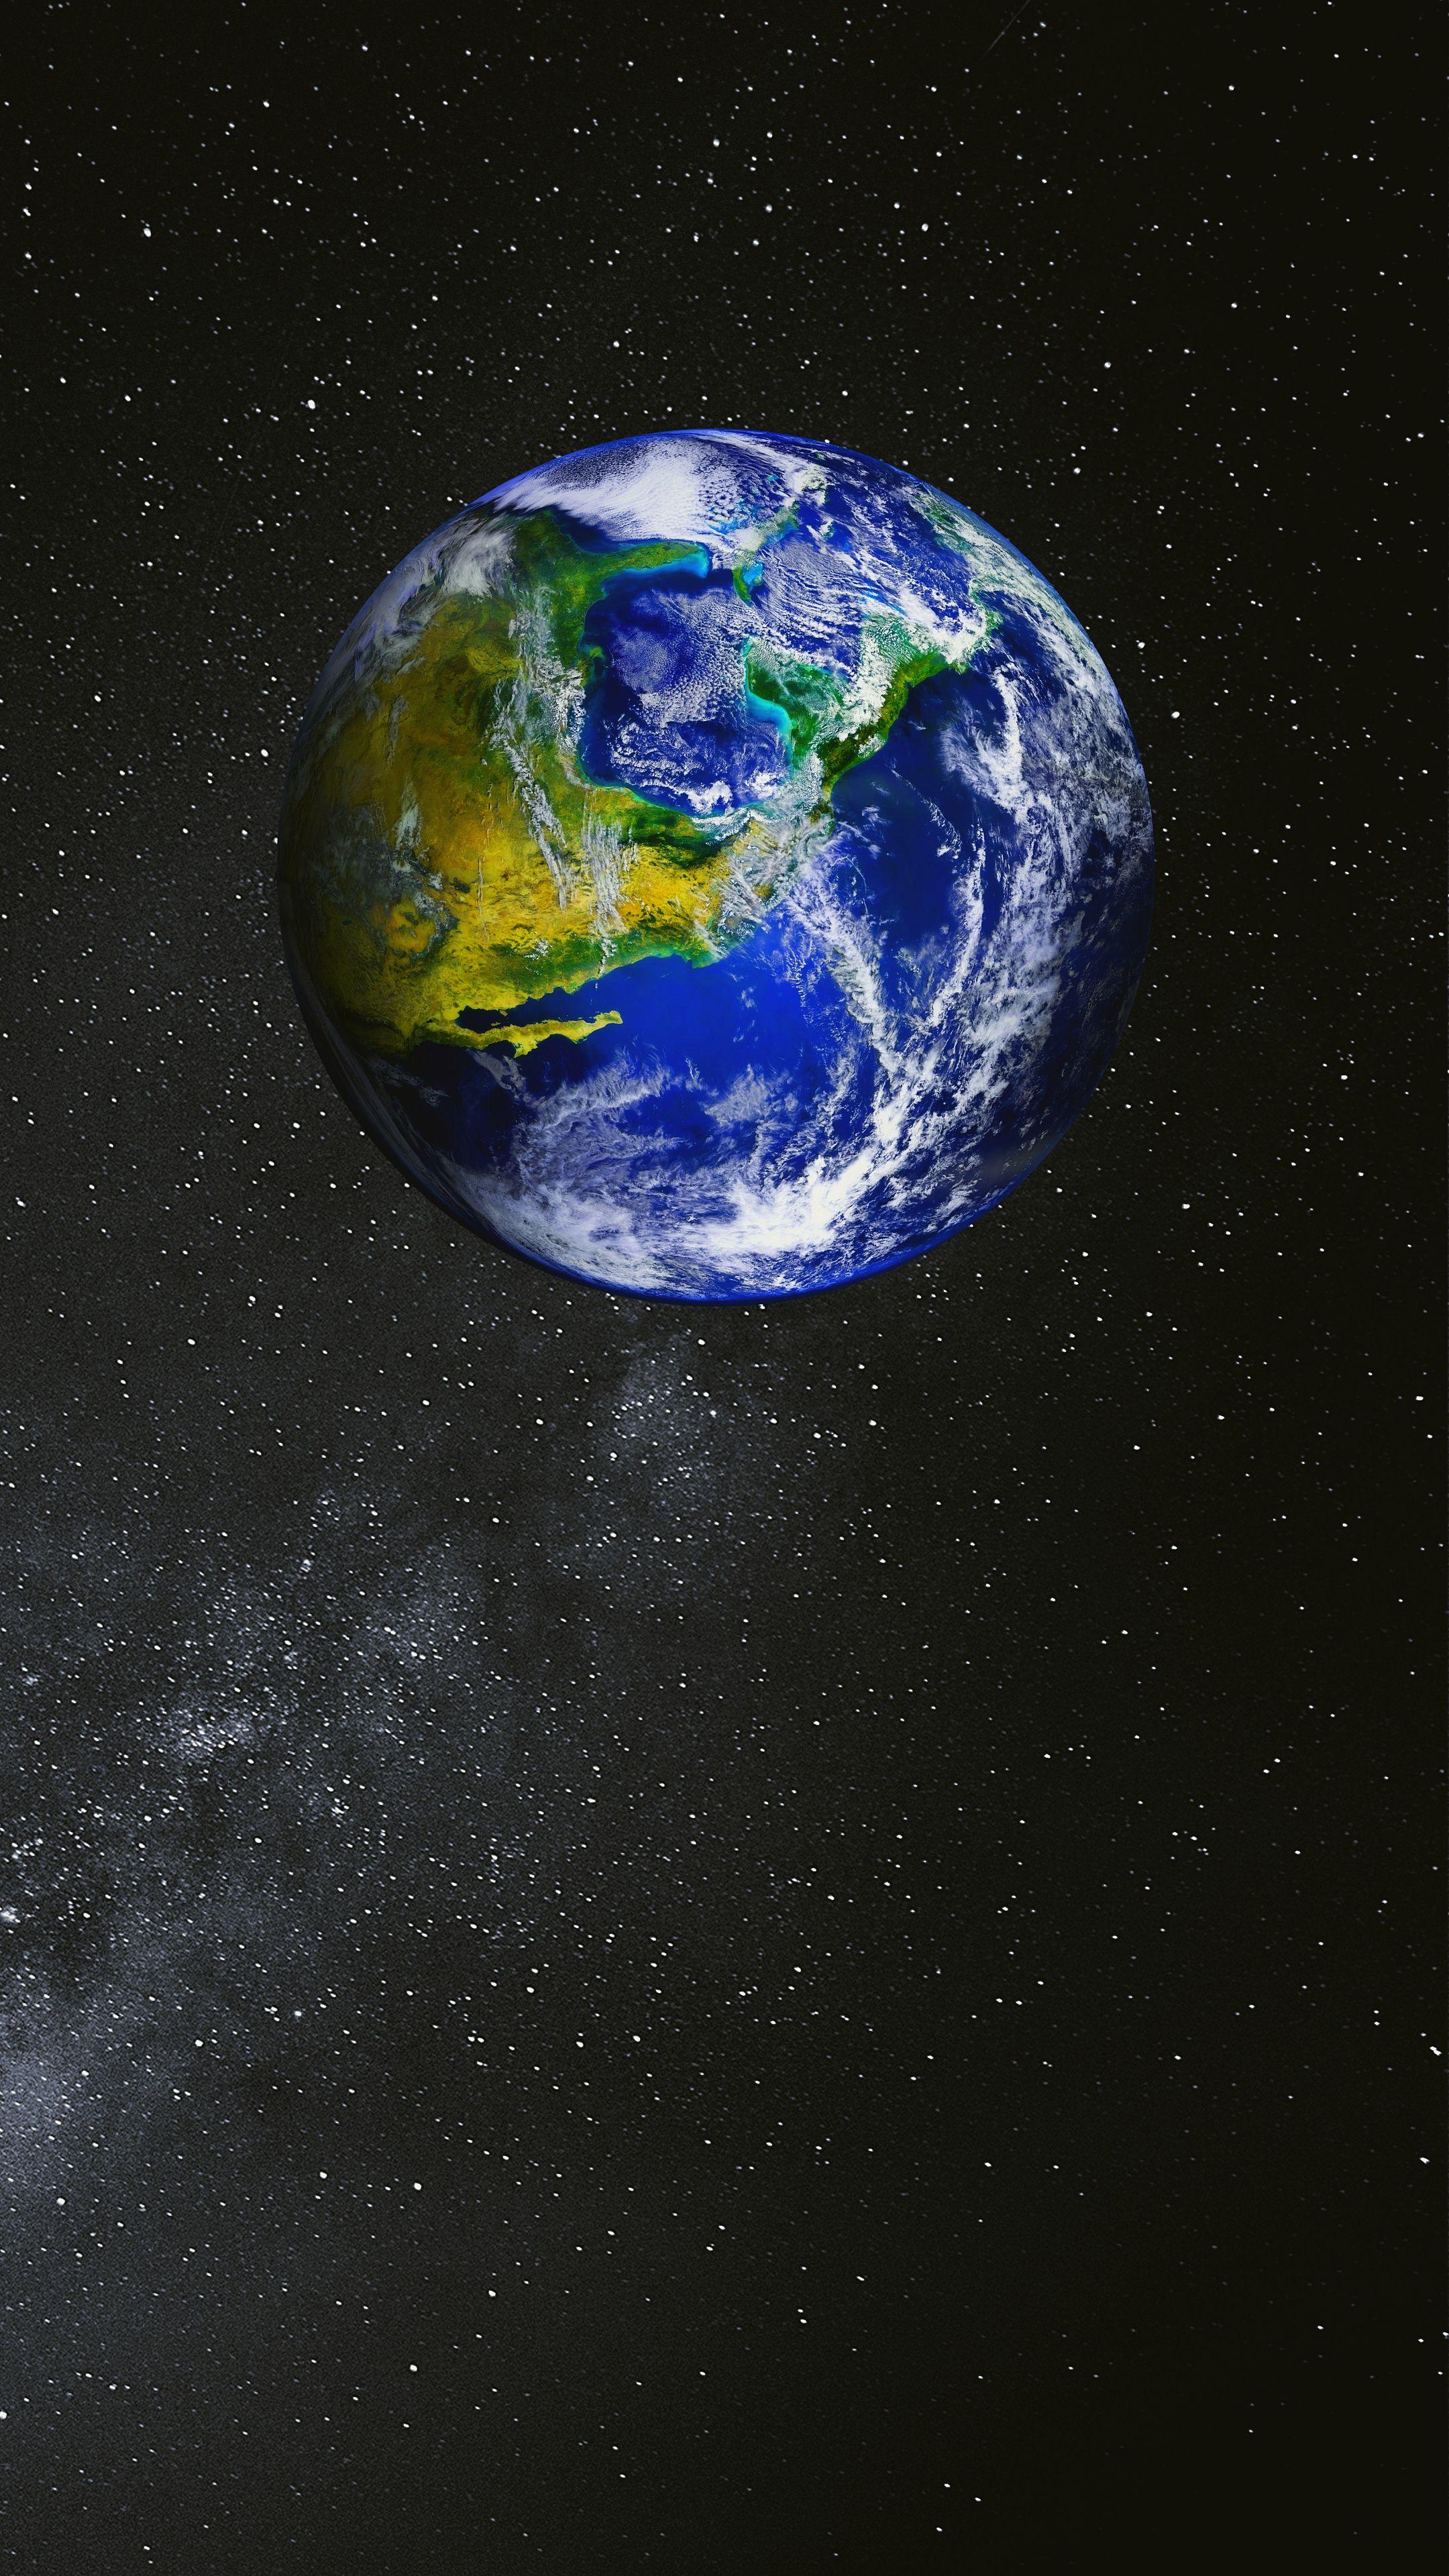 Planet Earth 4k Wallpaper 2160x3840 Iphone Wallpaper Earth Wallpaper Earth Hd Dark Wallpapers